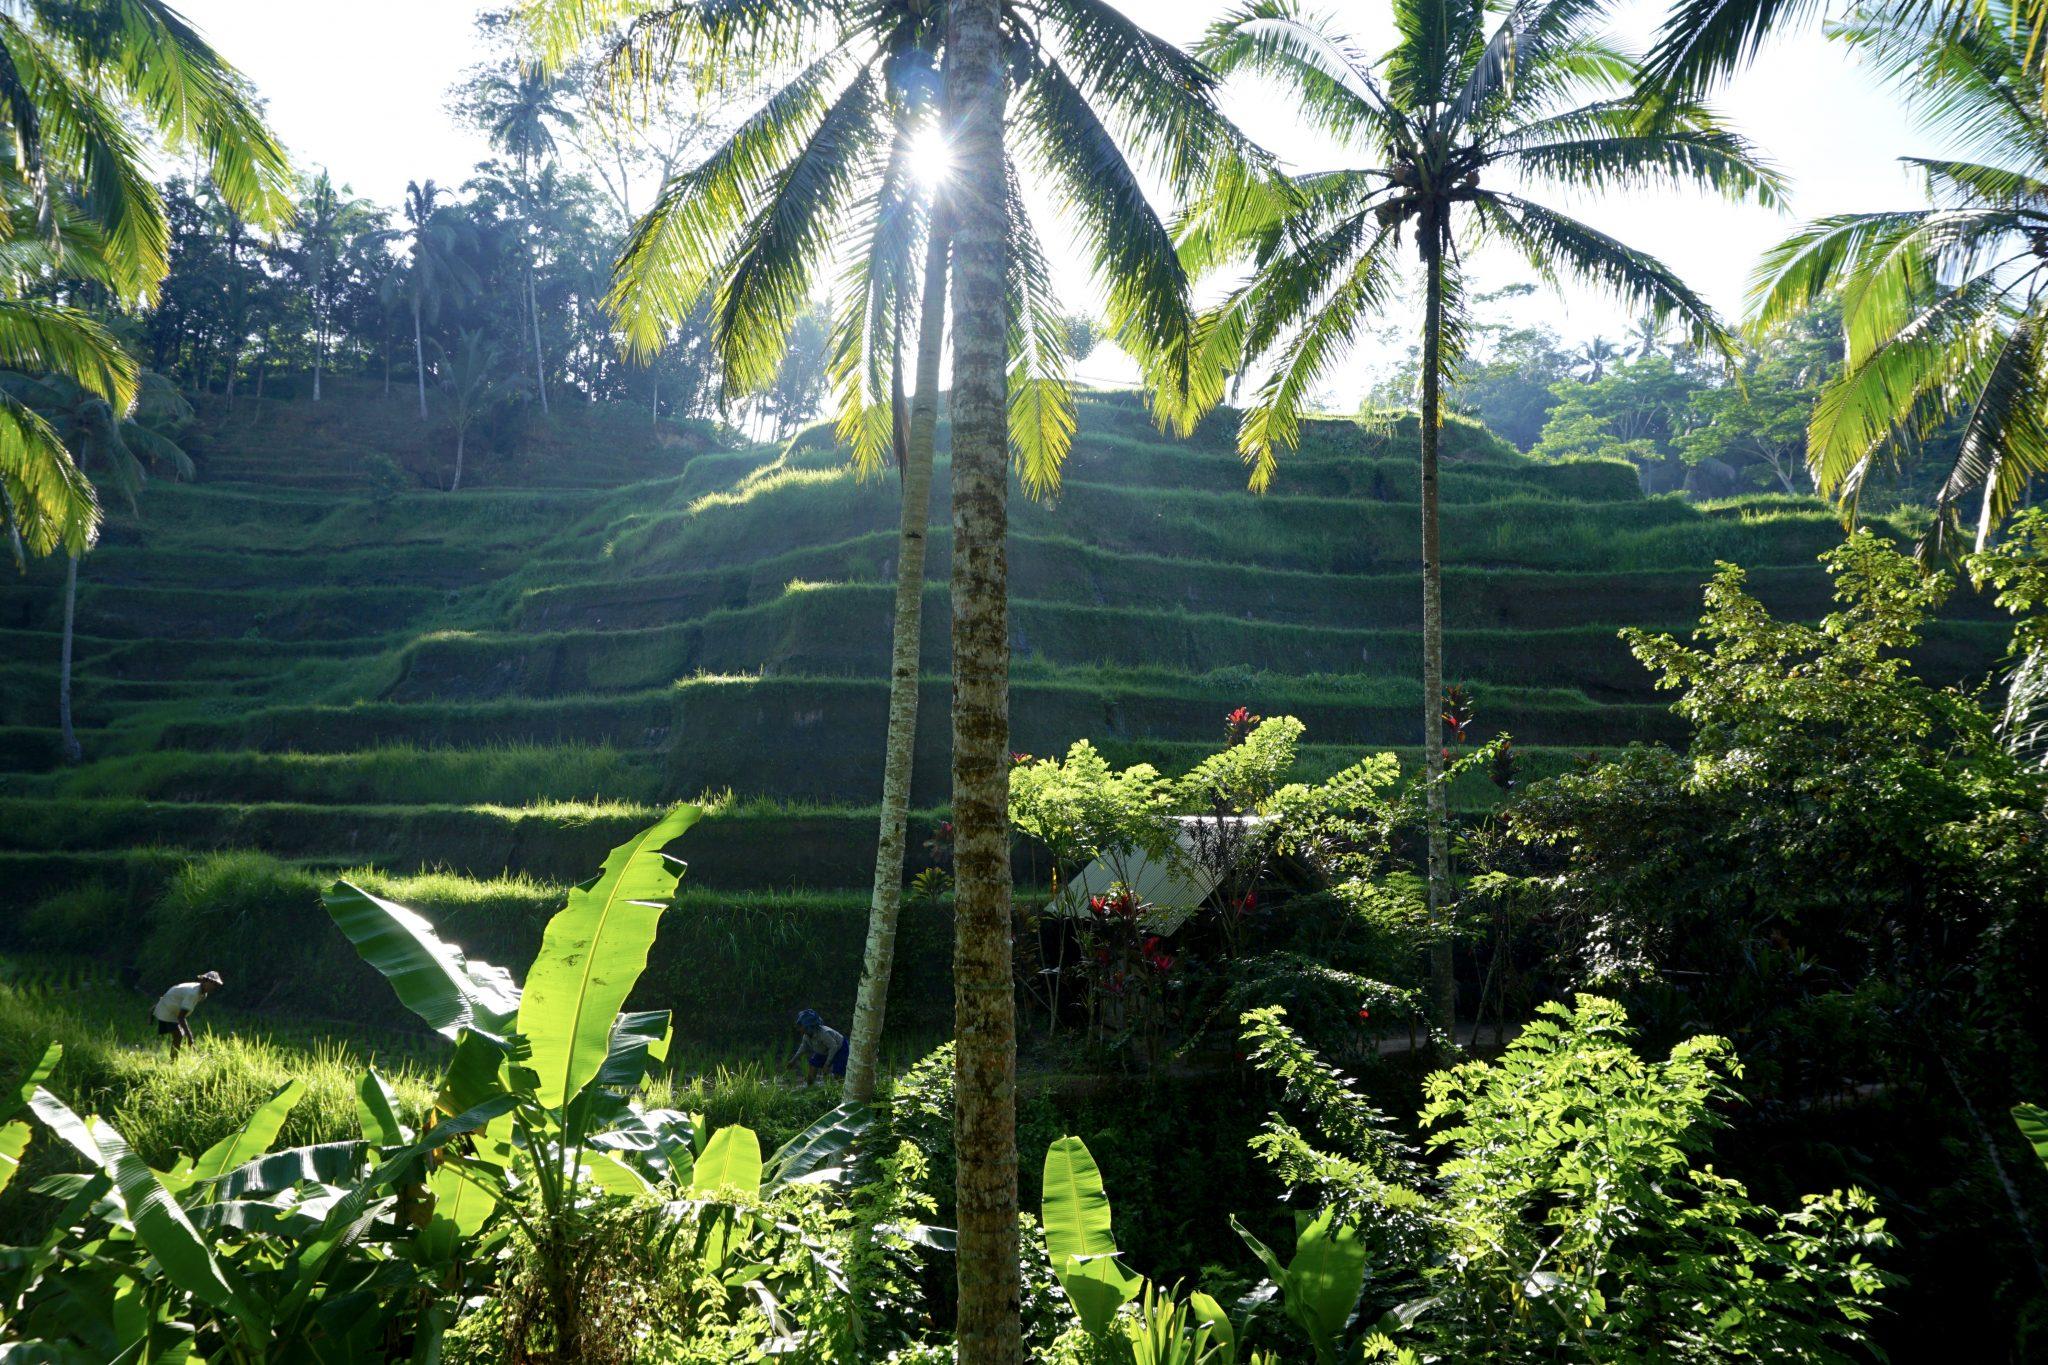 tegalalang, ubud, bali, rice terrace